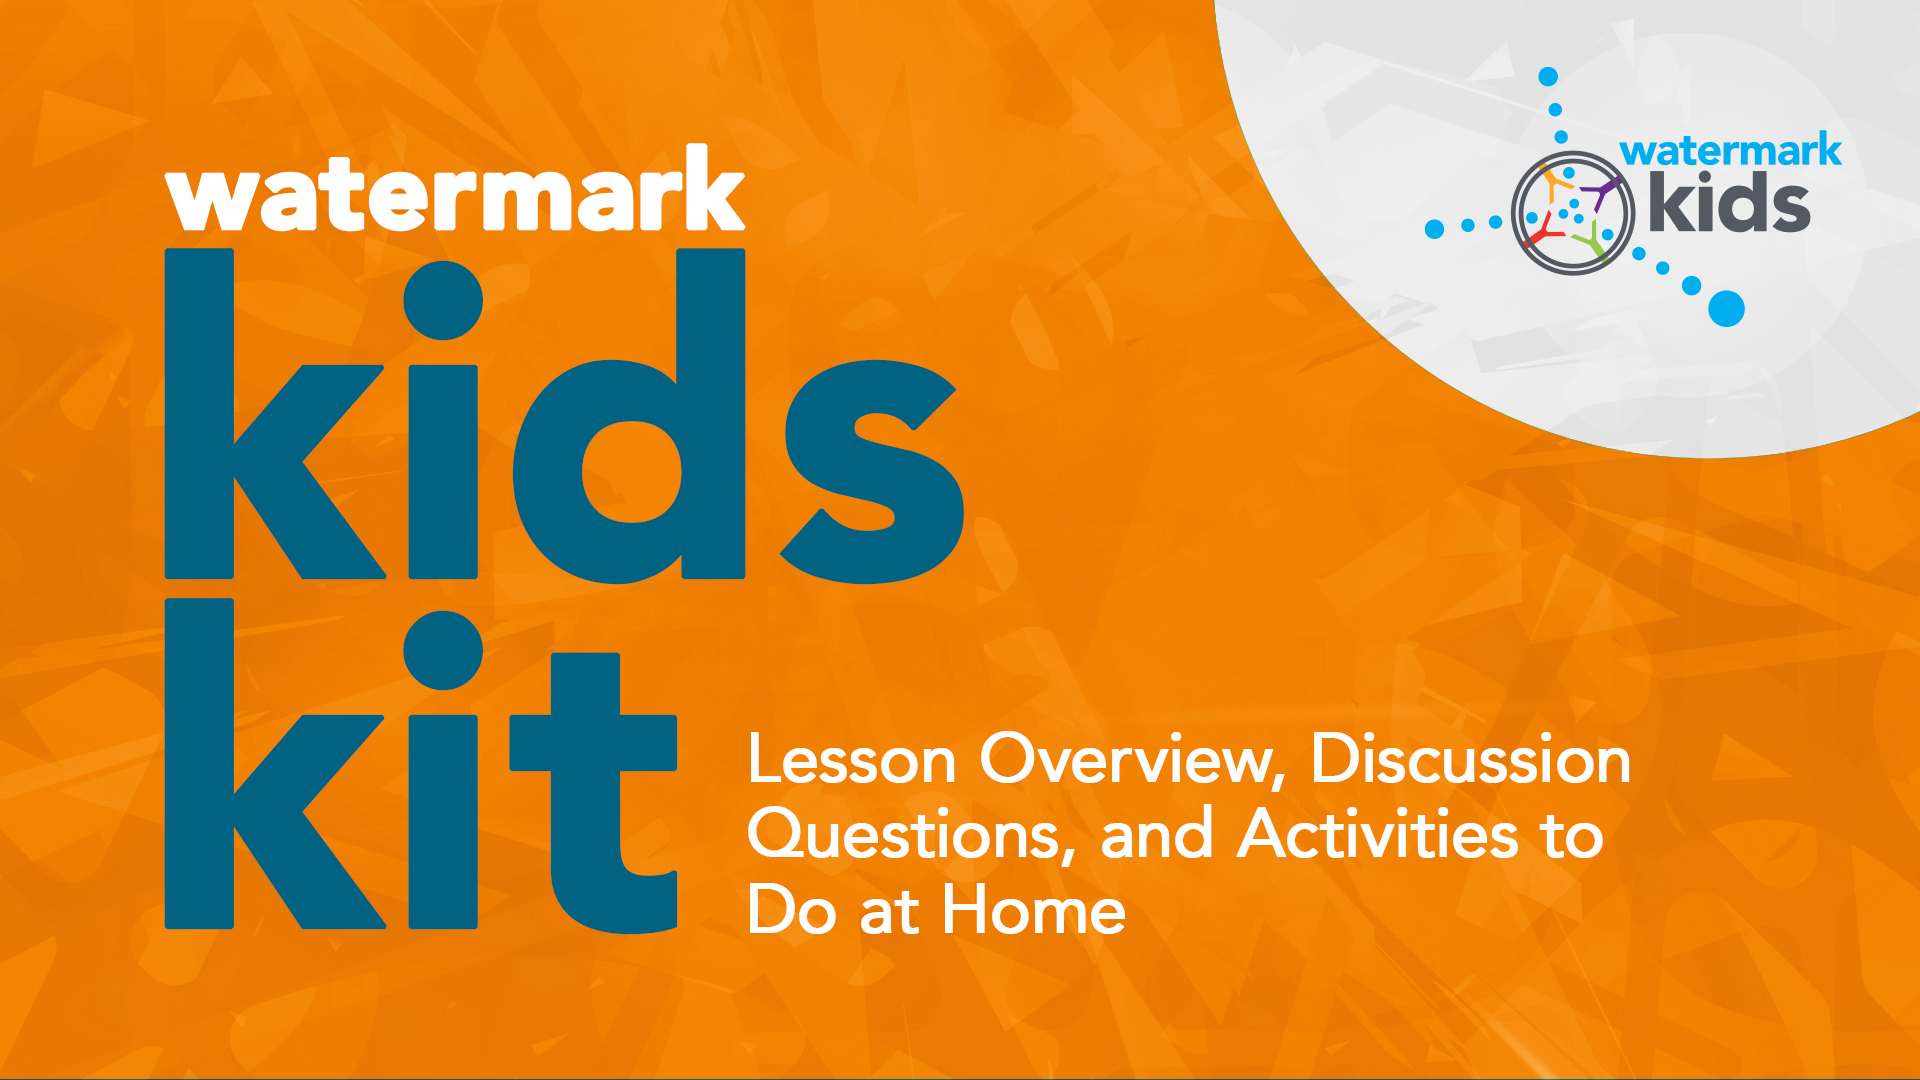 Watermark Kids Kit for May 3 Hero Image